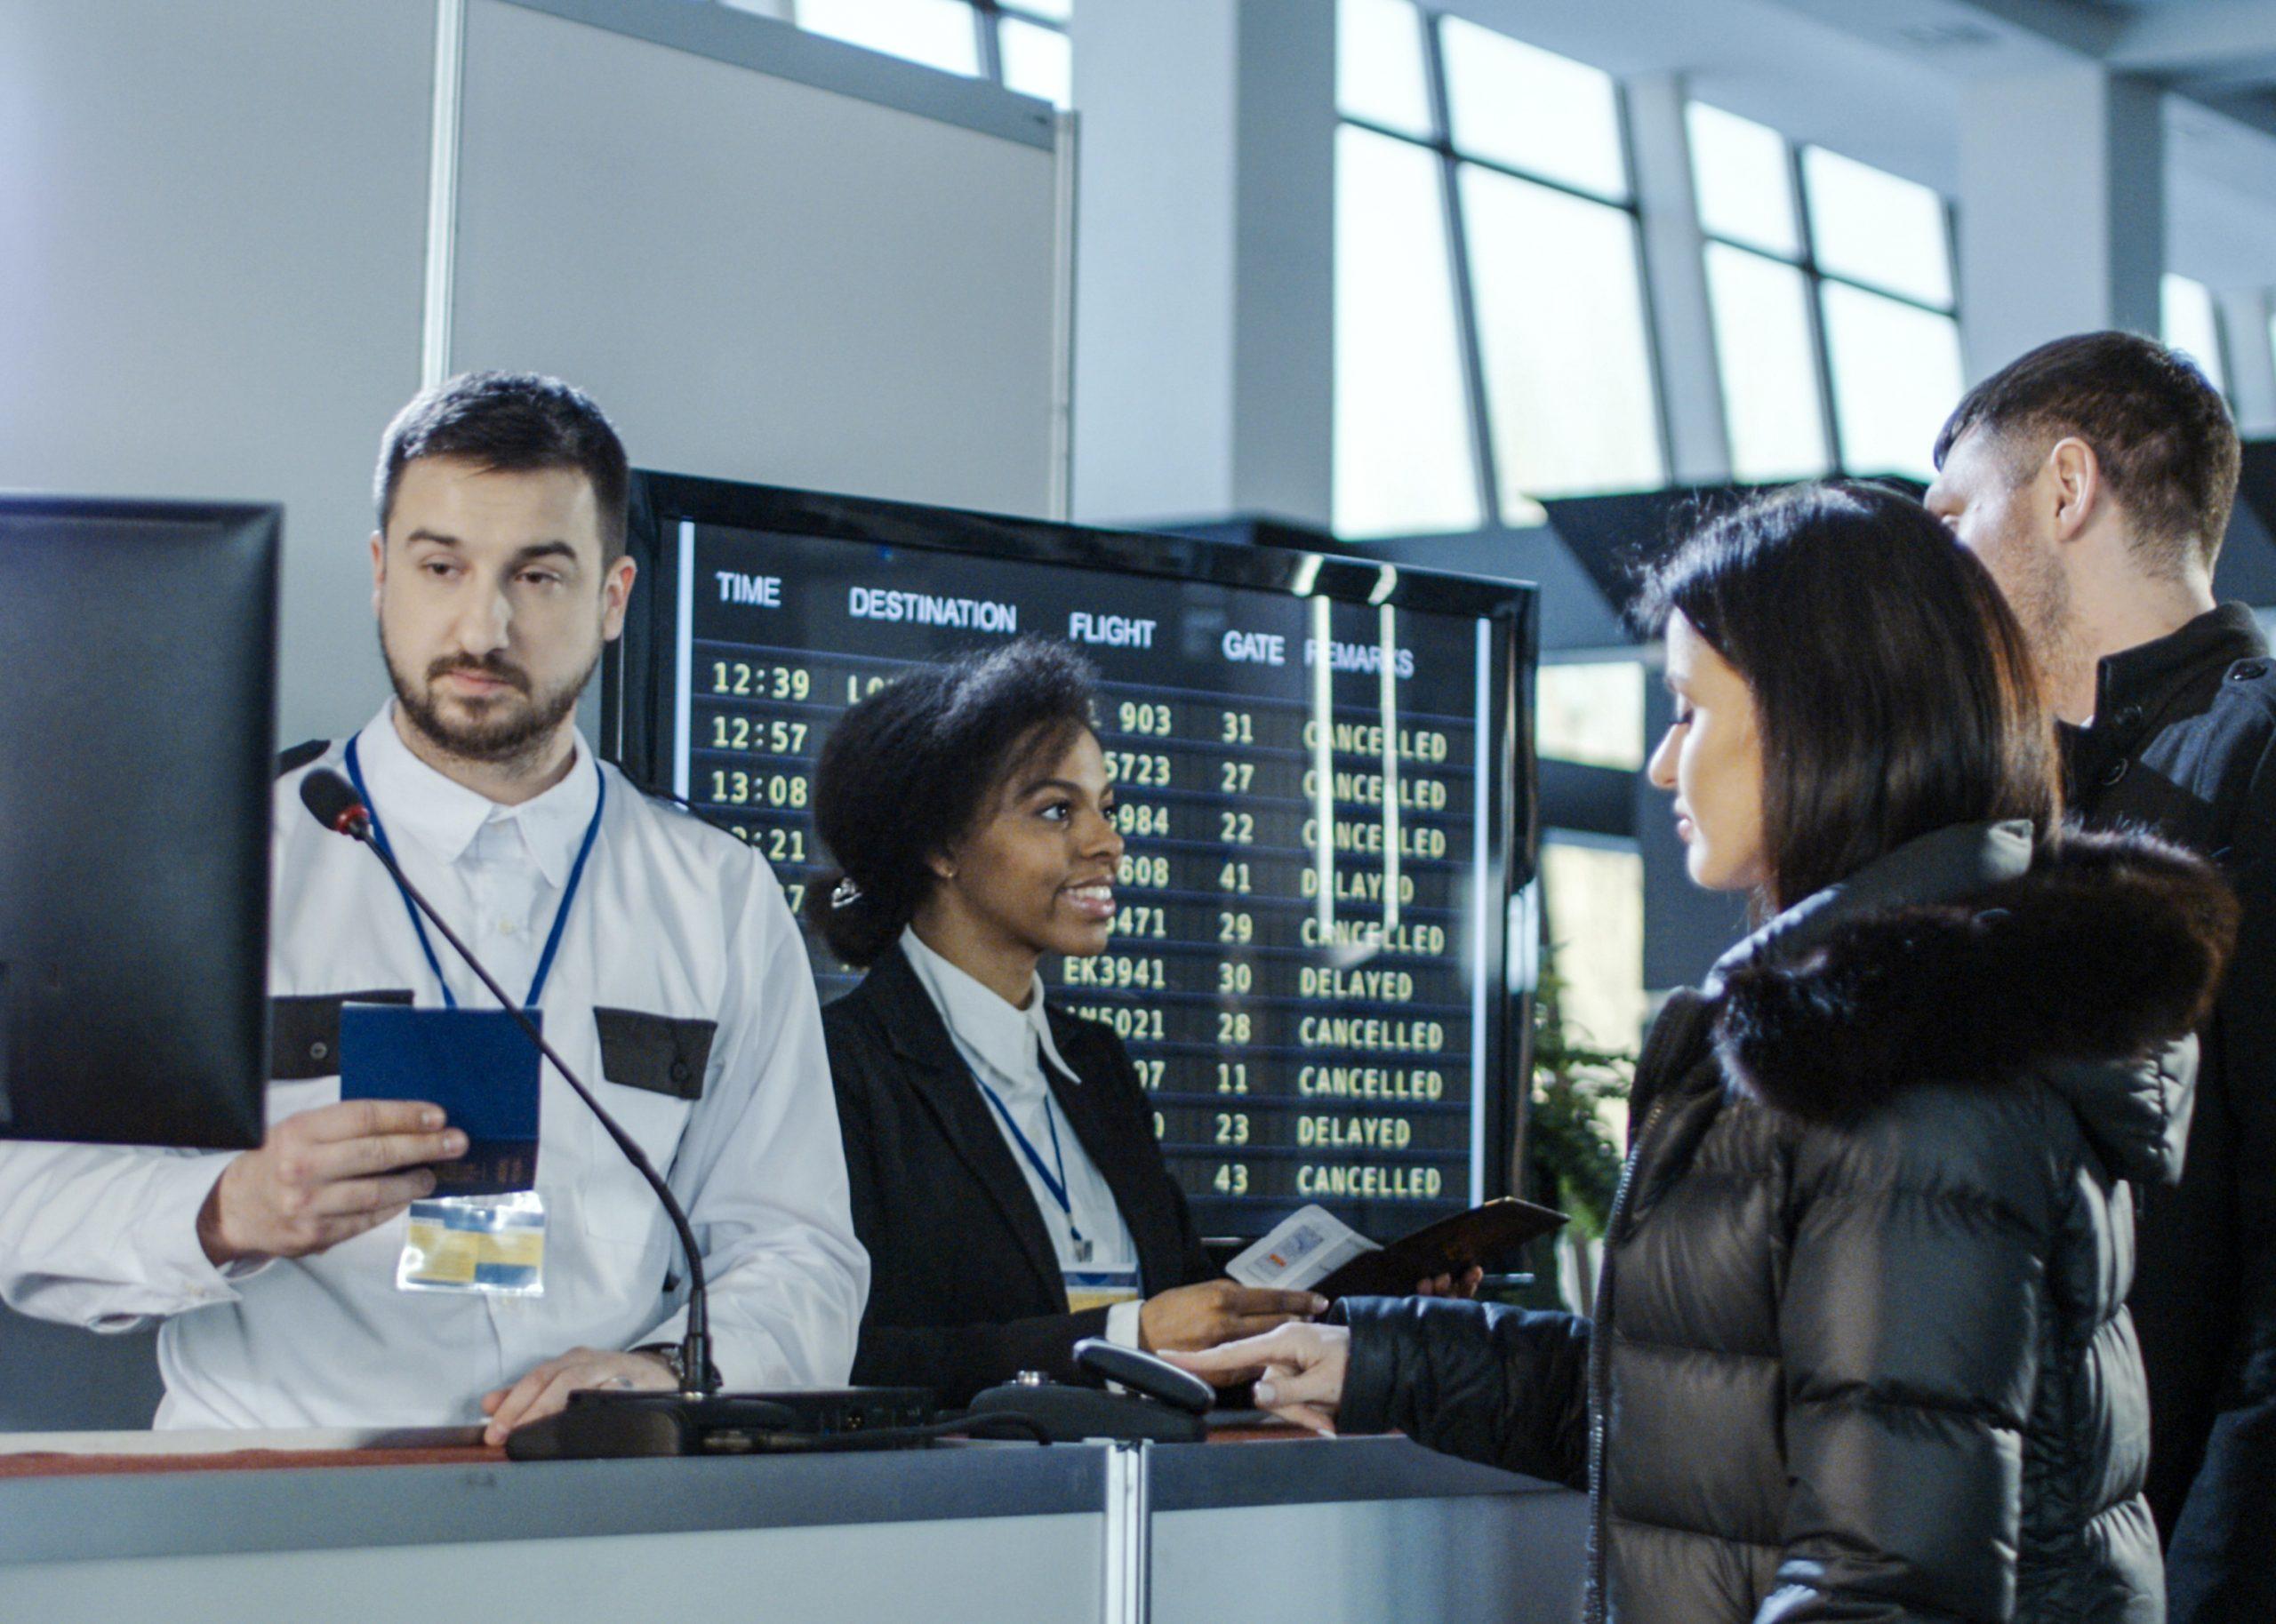 Osmond Passport Reader & ID Scanner   Adaptive Recognition